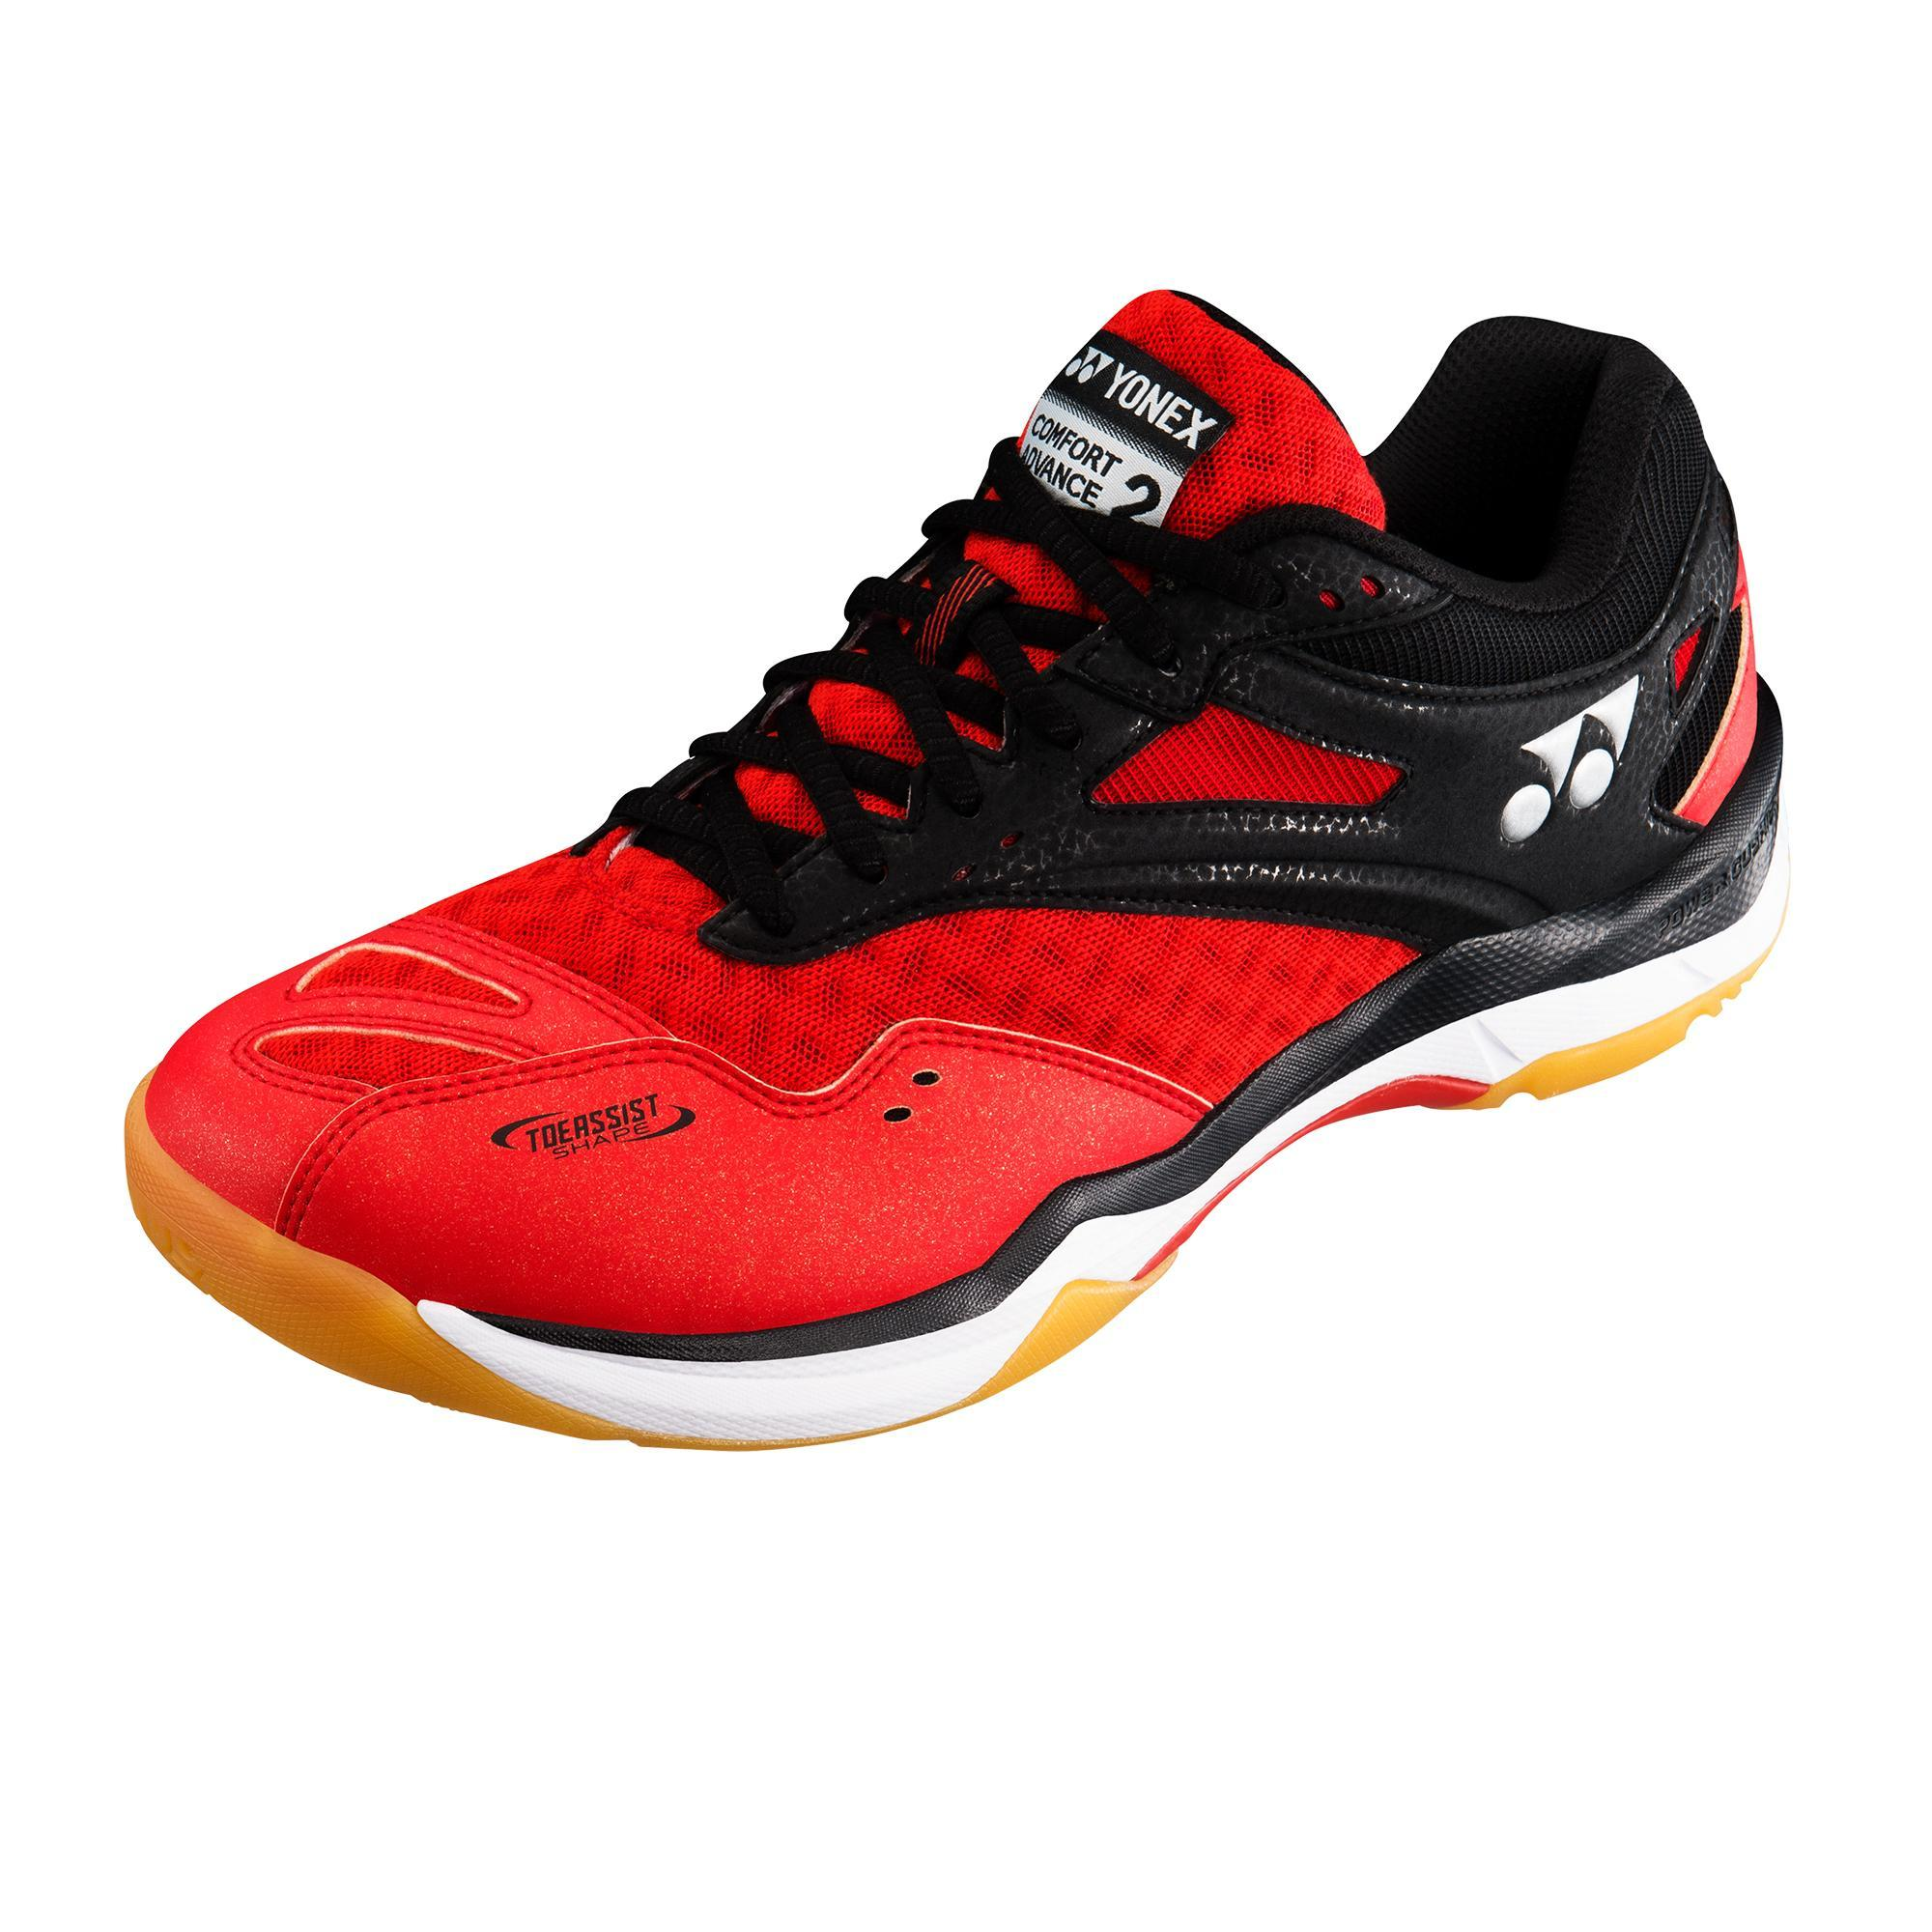 Katalog Harga Sepatu Futsal League Gioro 3 Premiere Advance 2018 Yonex  Olahraga Badminton Pria Wanita Comfort a6fffc3634